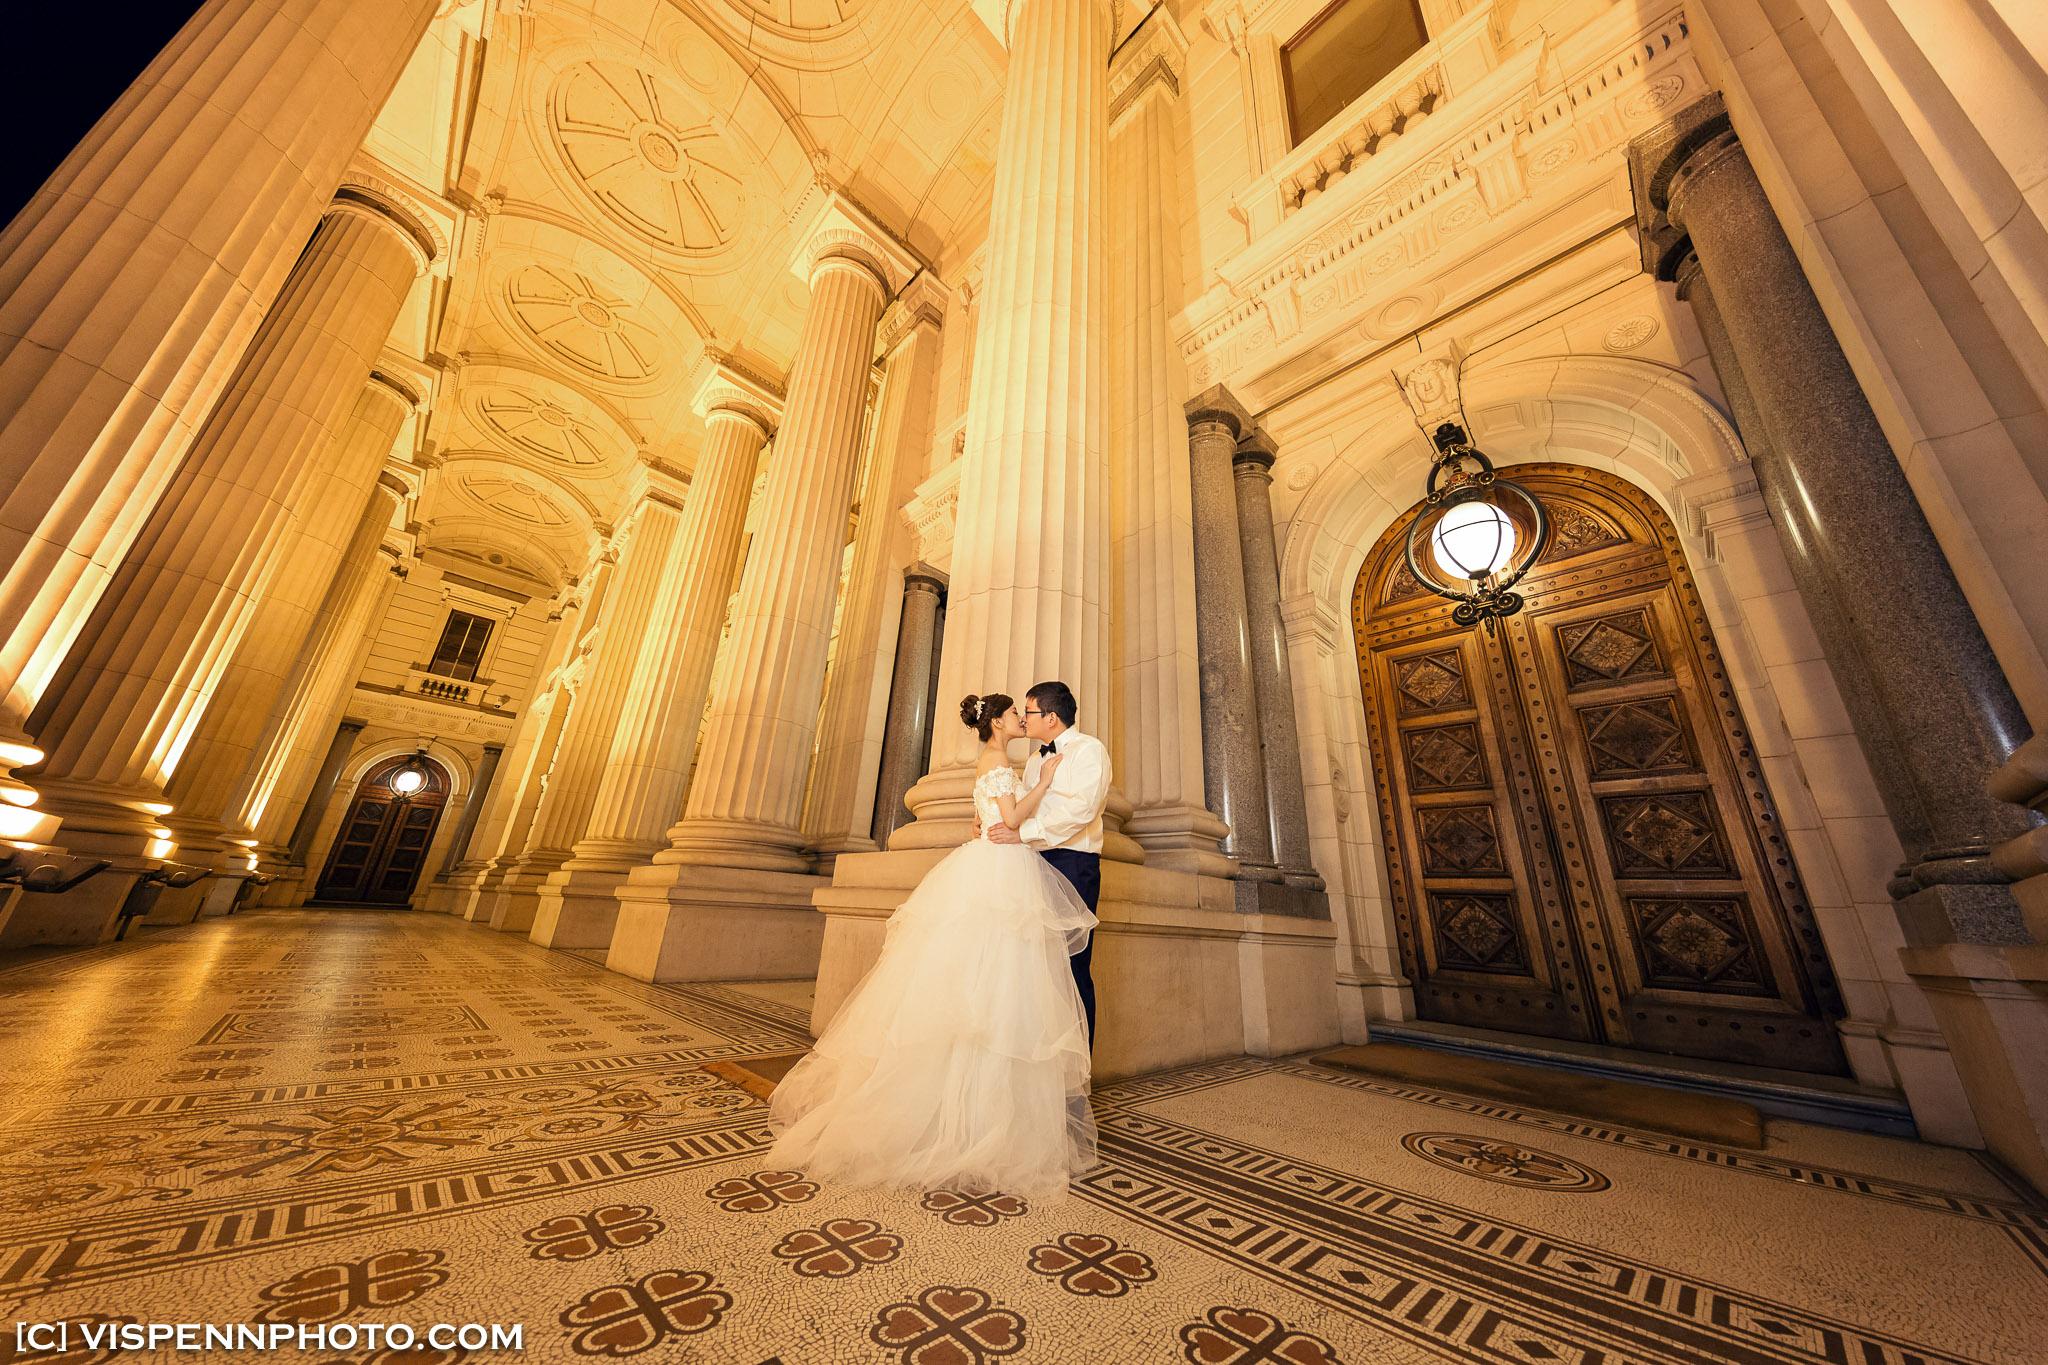 PRE WEDDING Photography Melbourne VISPENN 墨尔本 婚纱照 结婚照 婚纱摄影 VISPENN Olivia 3509